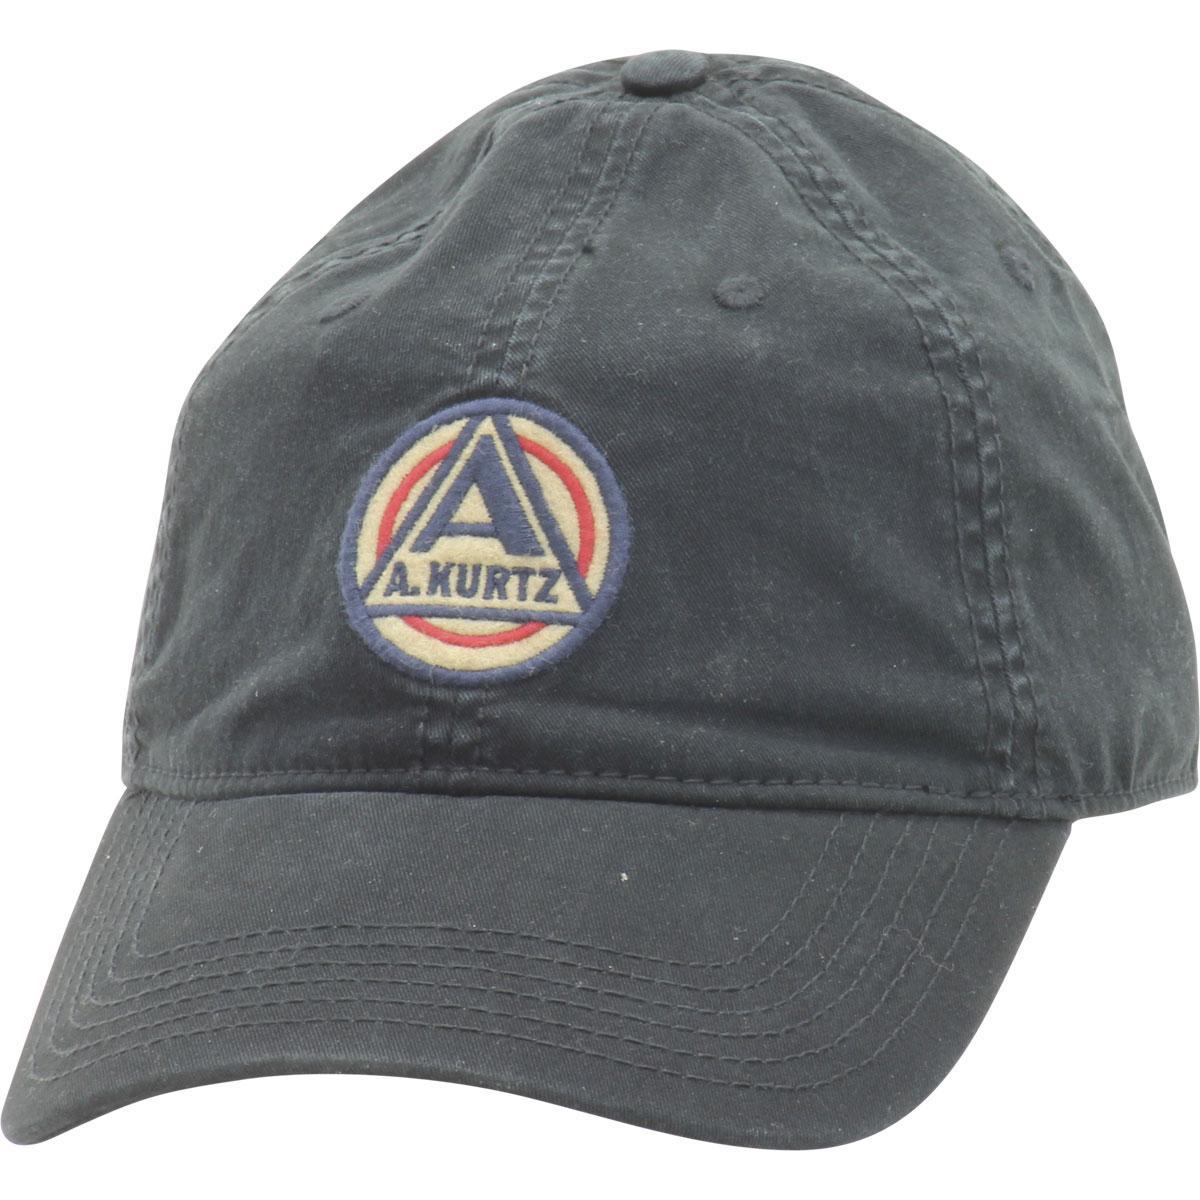 Image of Kurtz Men's AKurtz Patch Flex Baseball Cap Hat - Black - One Size Fits Most